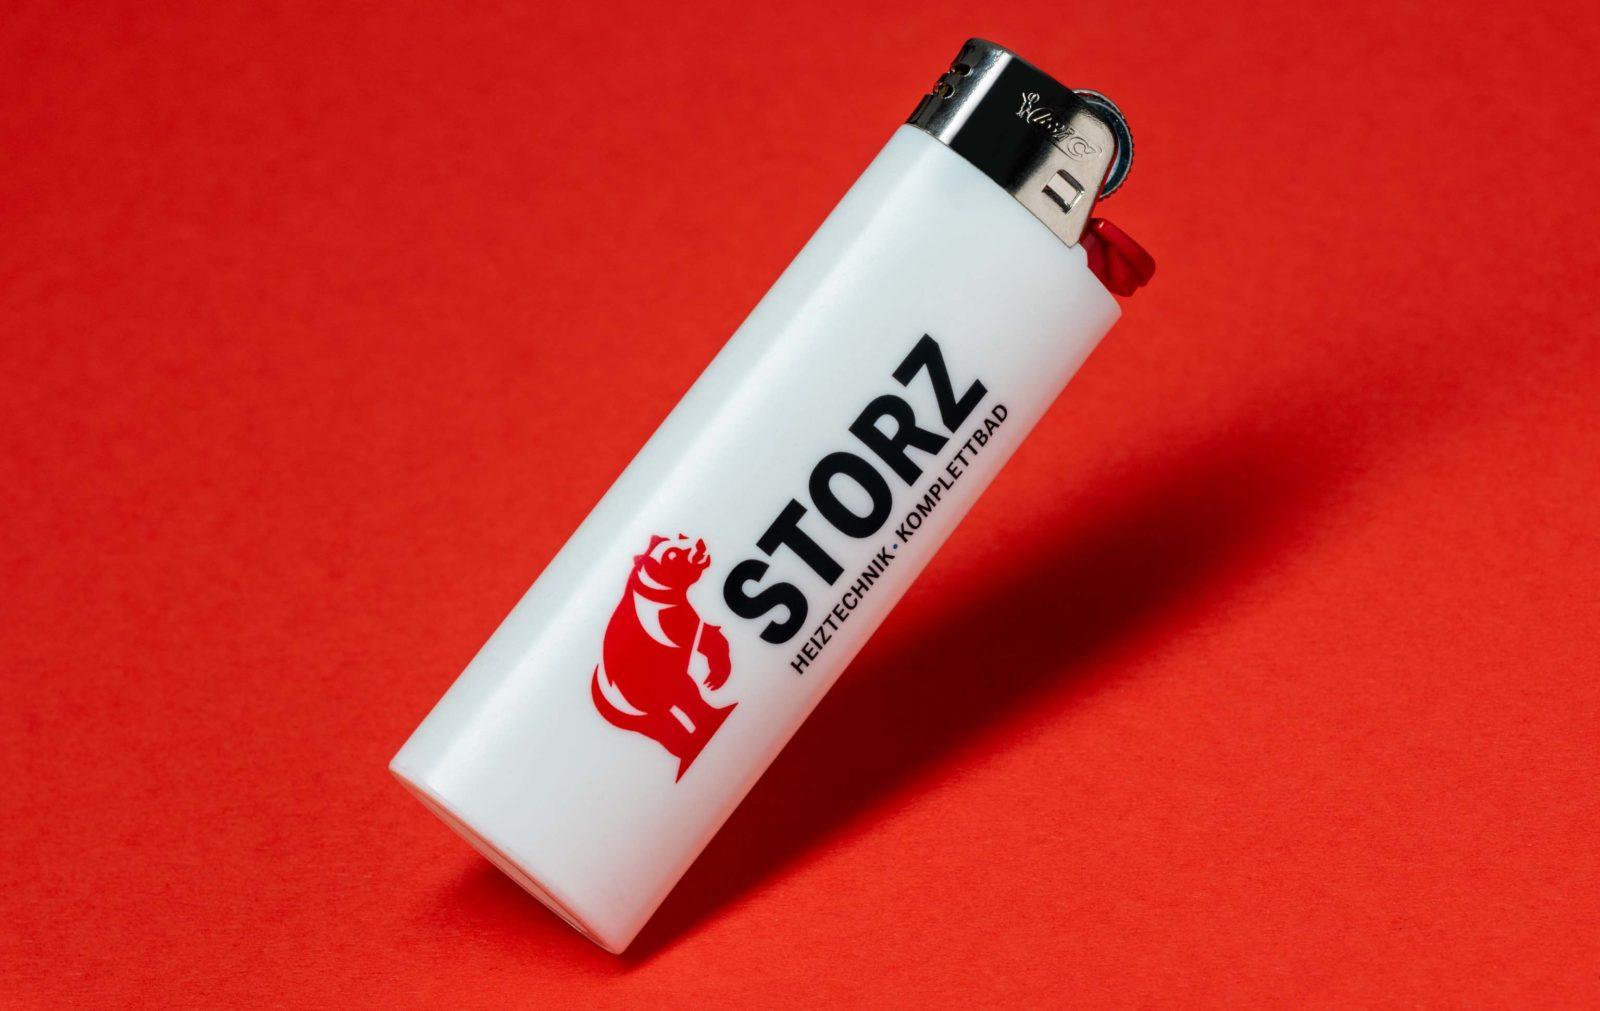 Storz Heiztechnick Feuerzeug